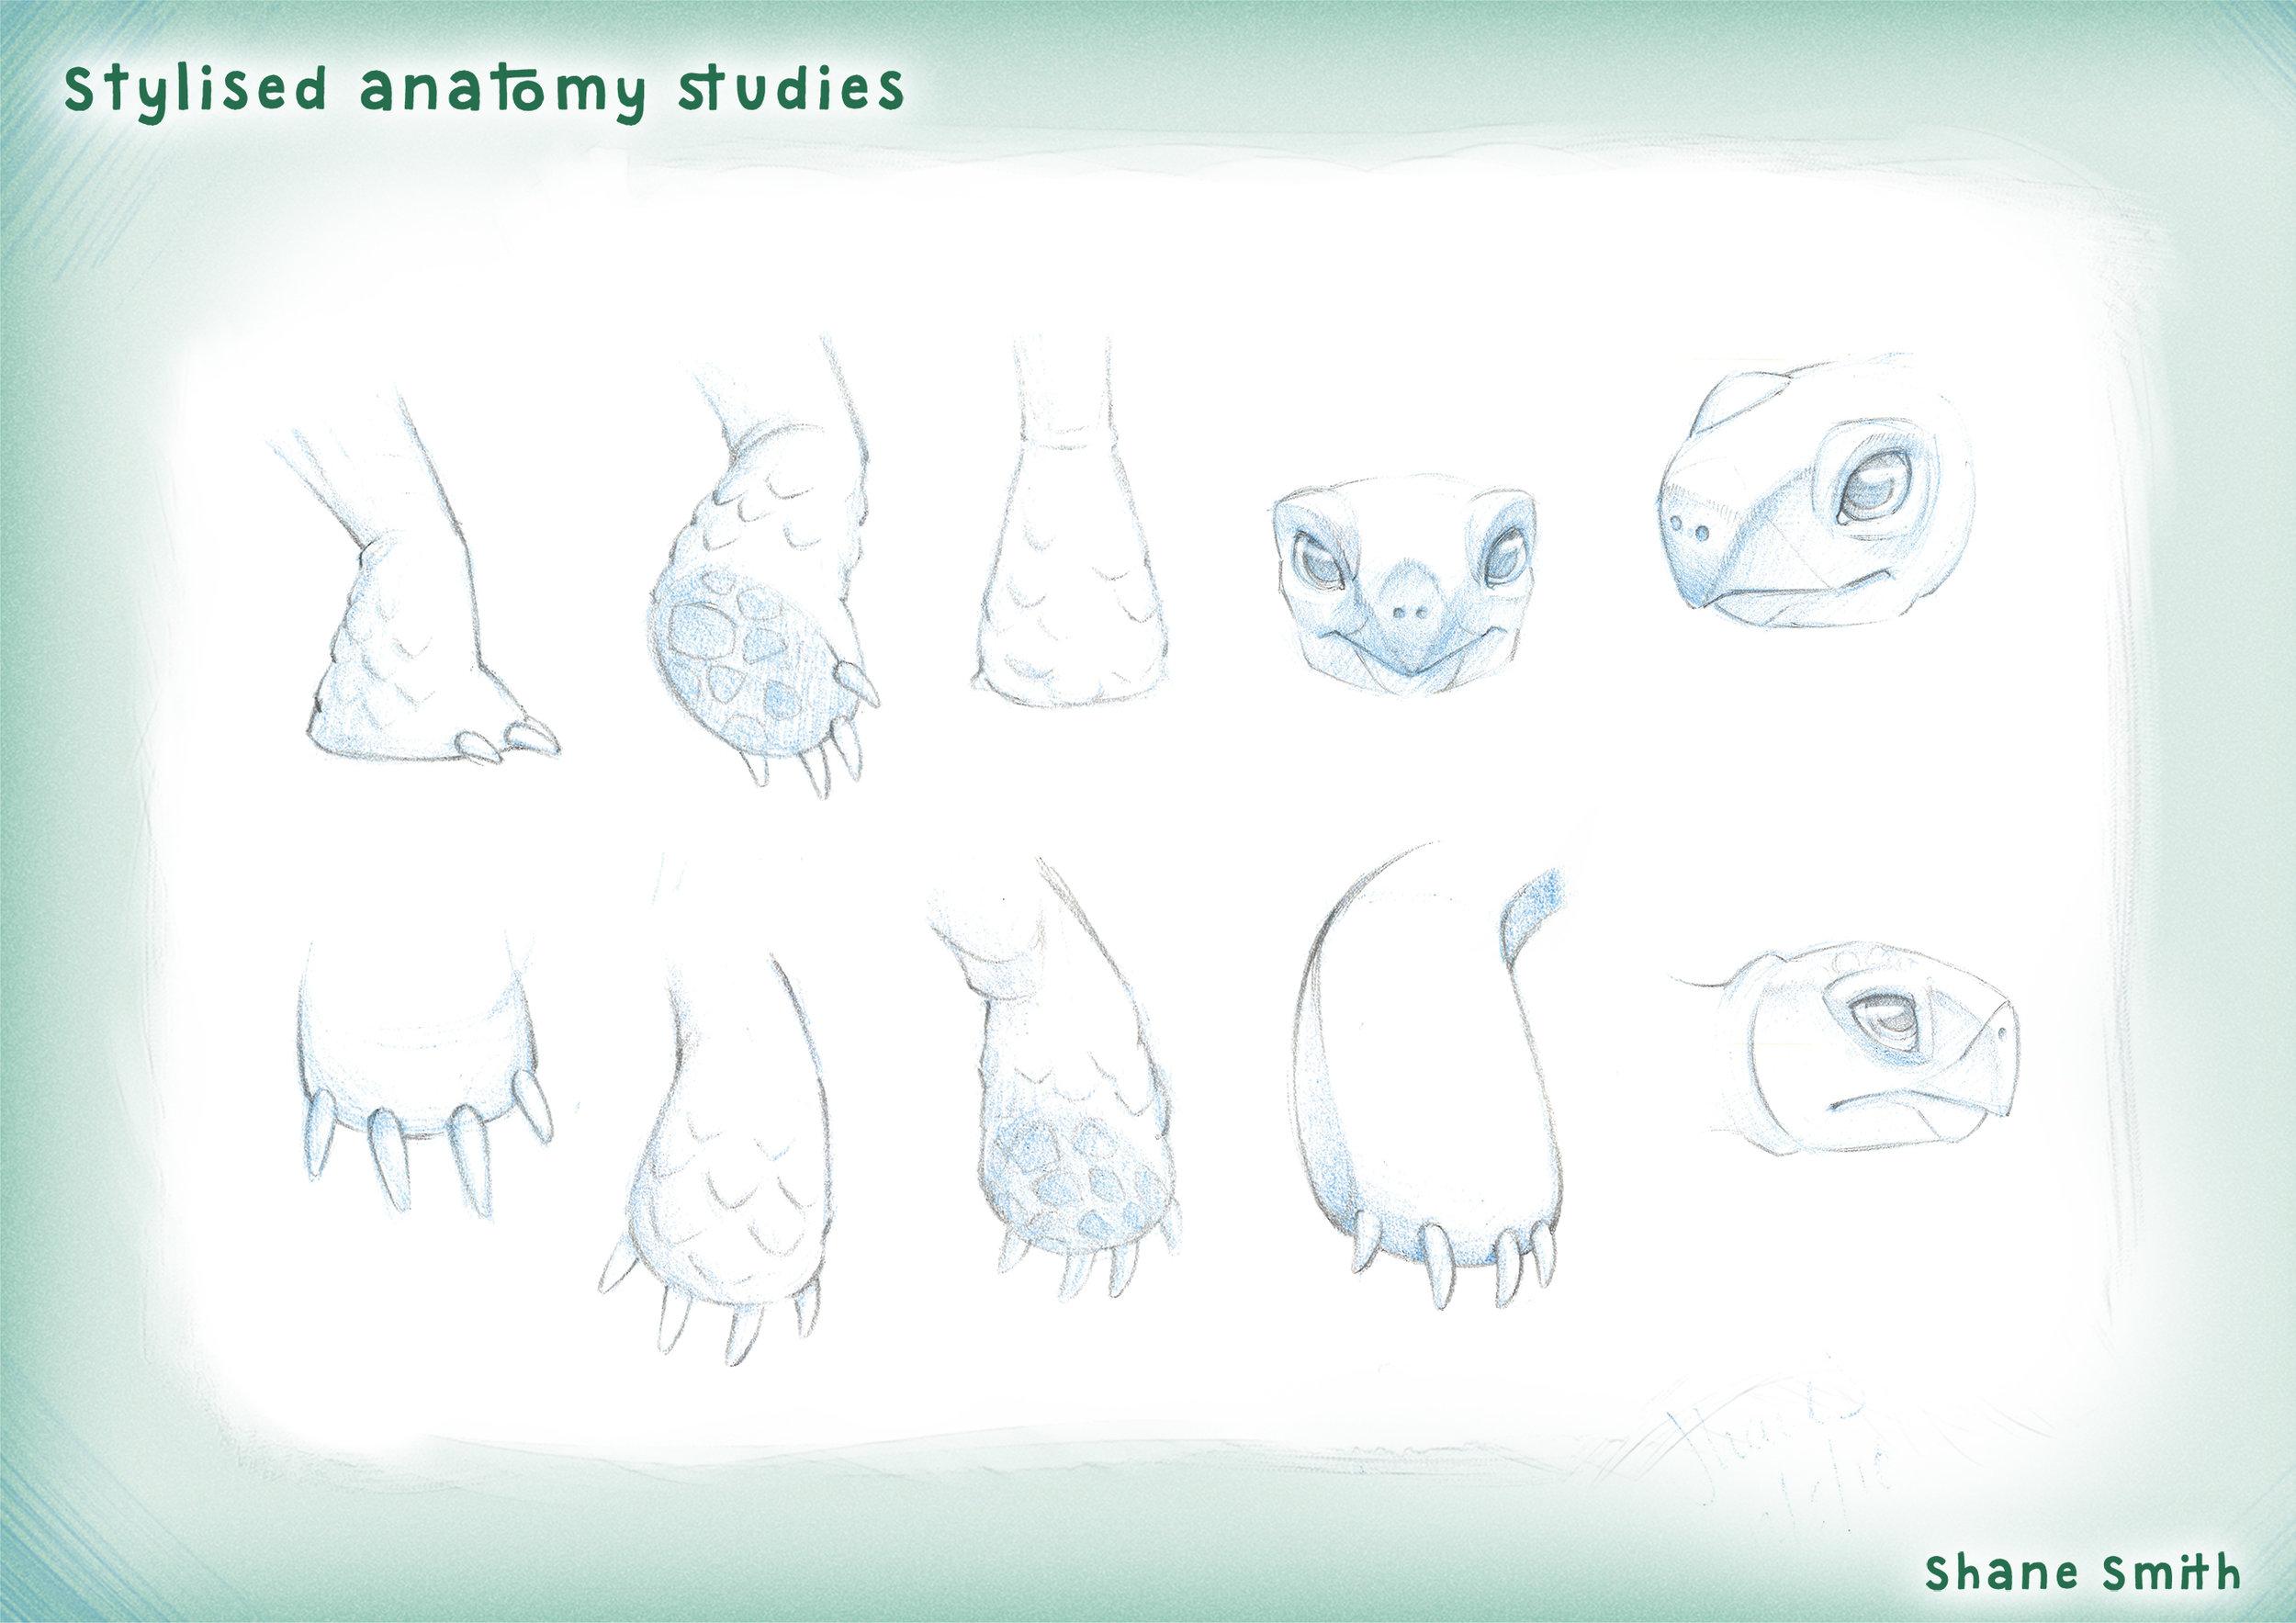 1 - Stylised anatomy studies NO PS BRANDING.jpg